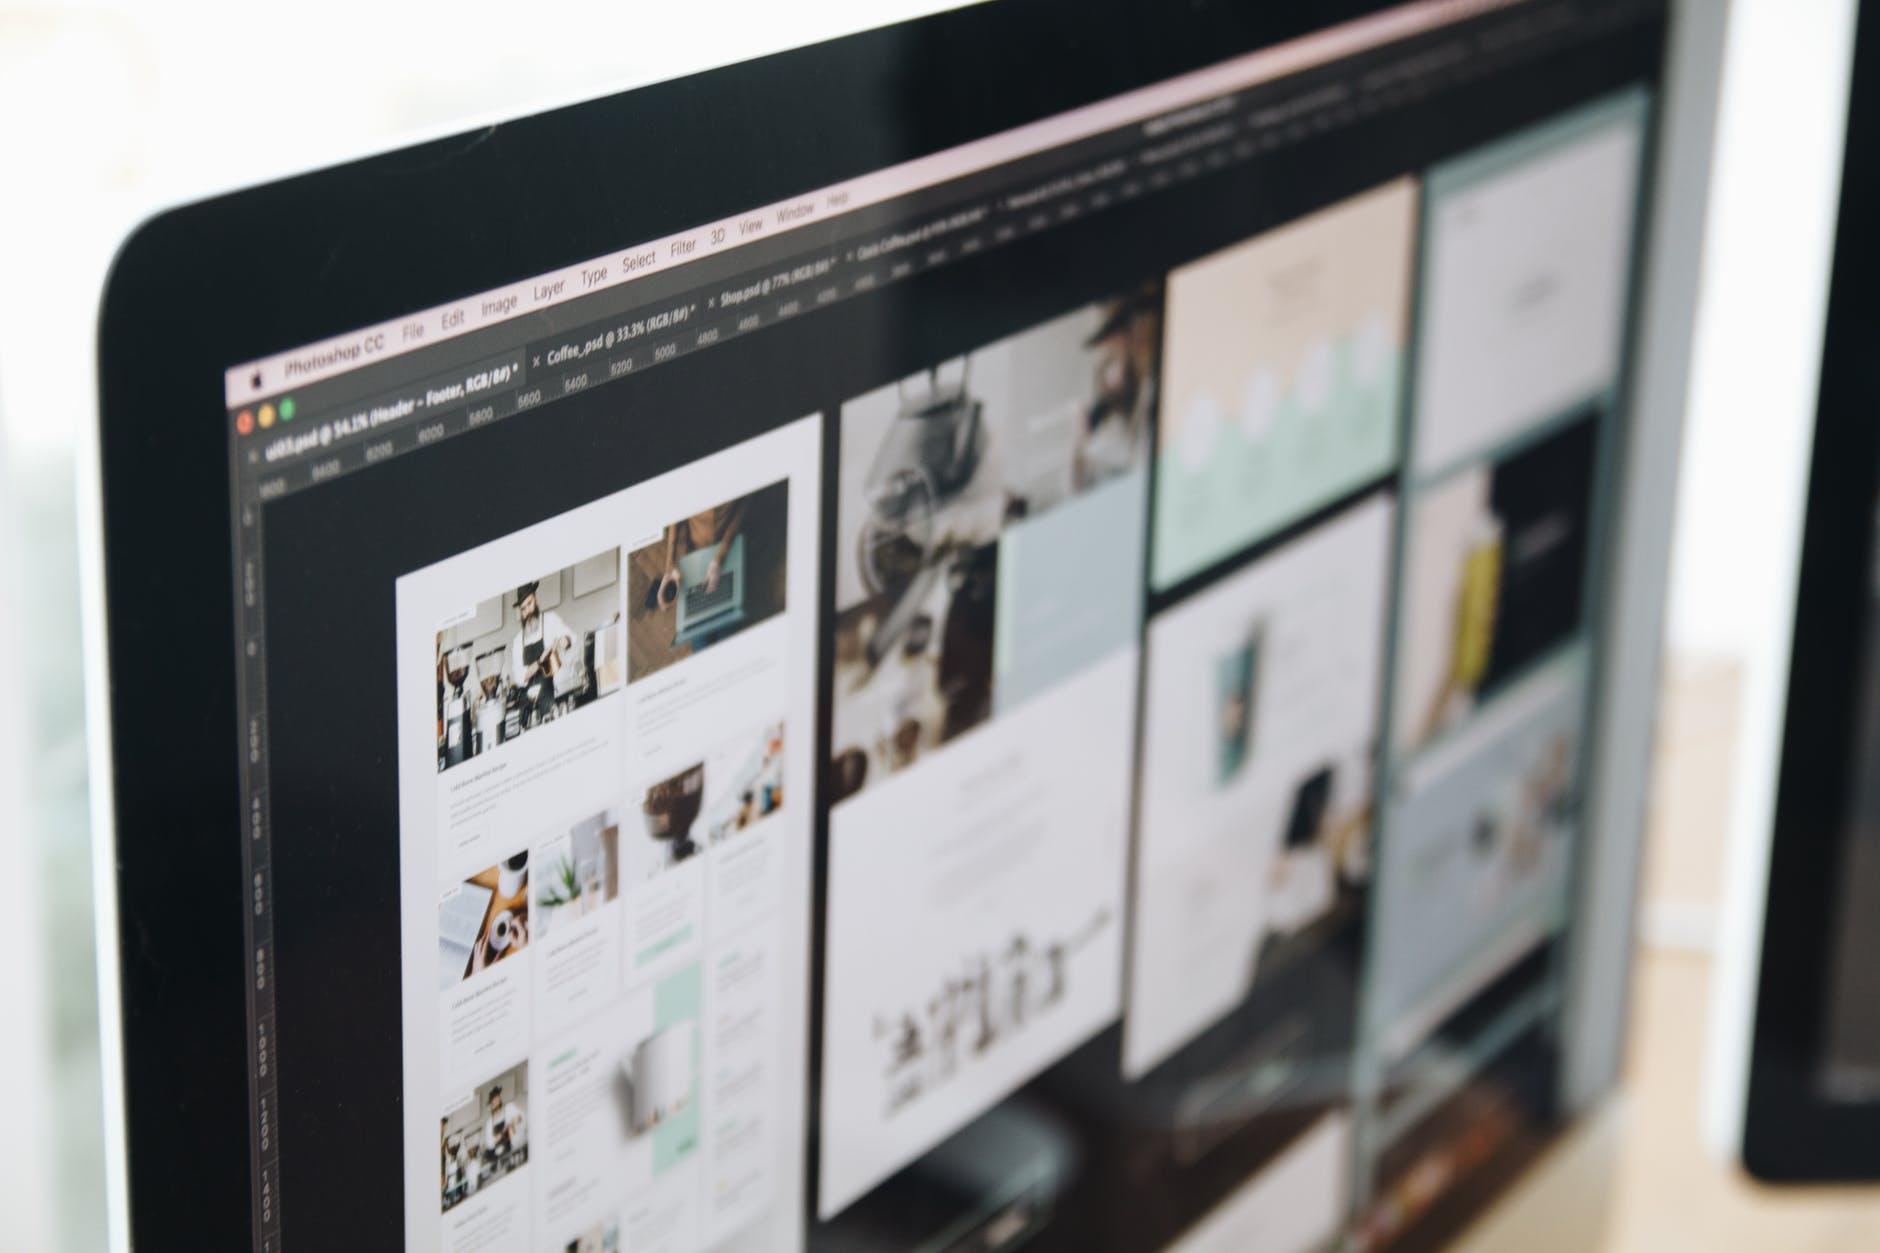 Jump Forward Media; Best Agency for Web Design in Nashville, TN